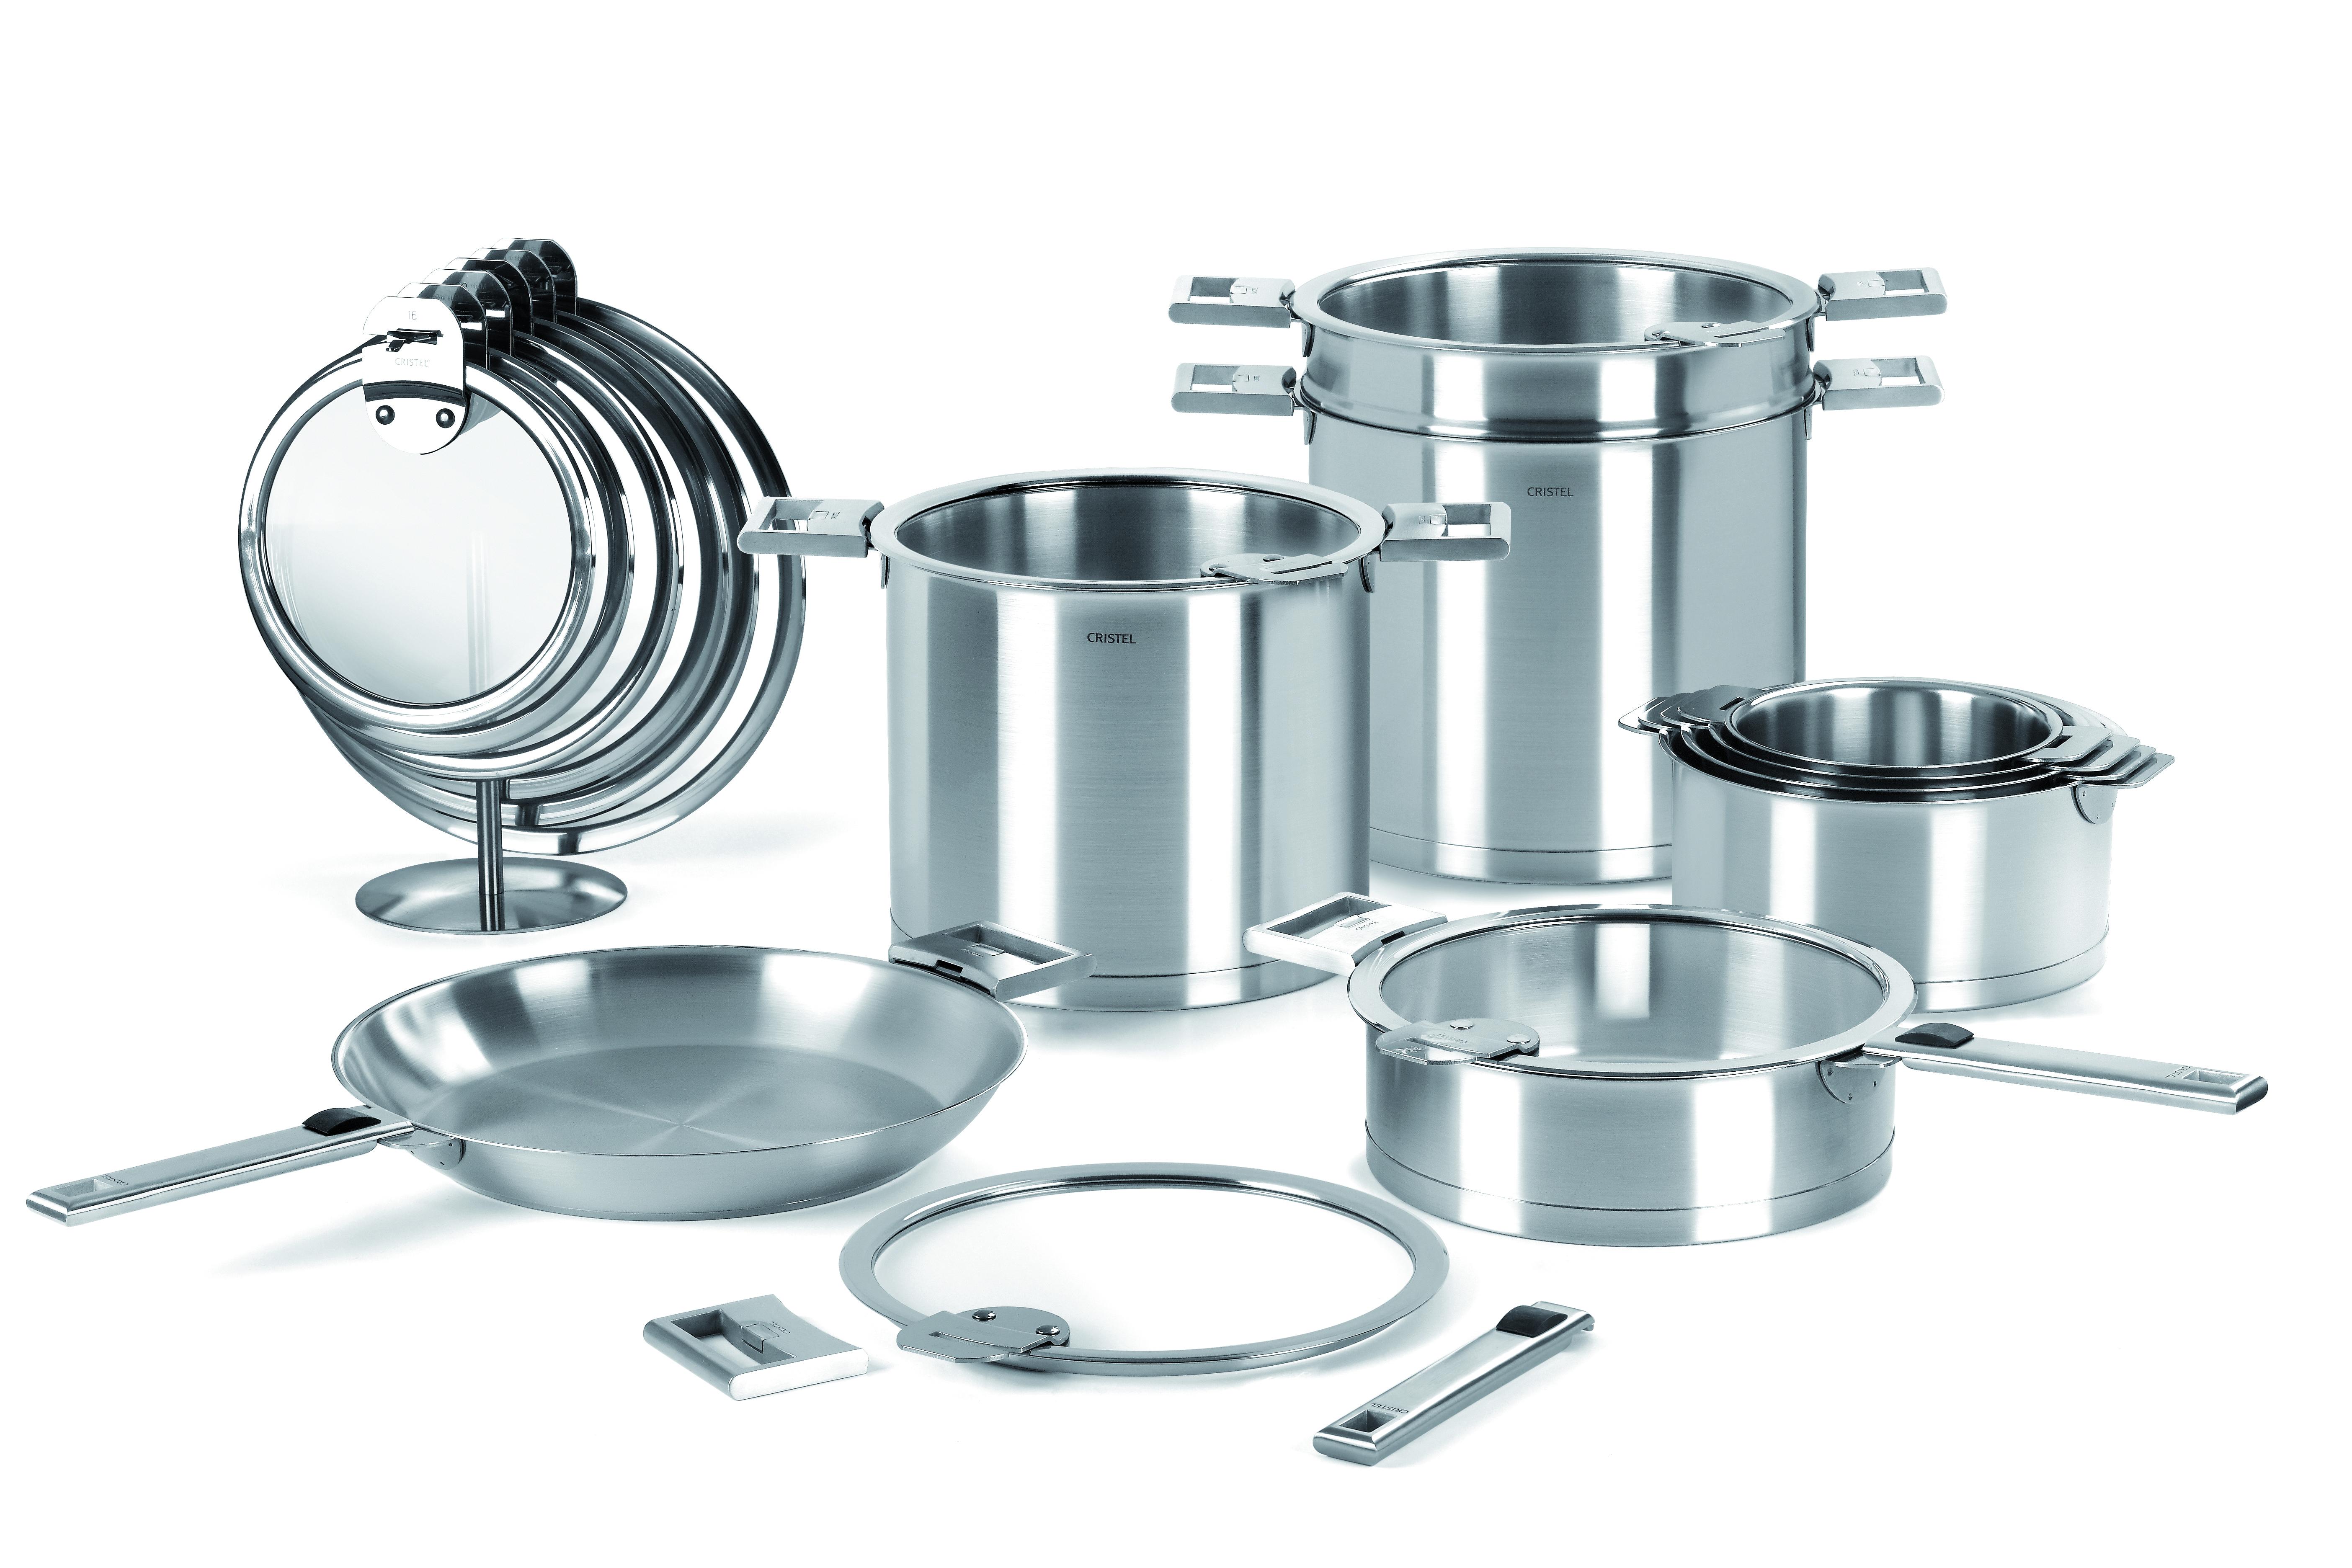 cristel cuisine design et fabrication franaise with cristel cuisine fabulous lot de casseroles. Black Bedroom Furniture Sets. Home Design Ideas